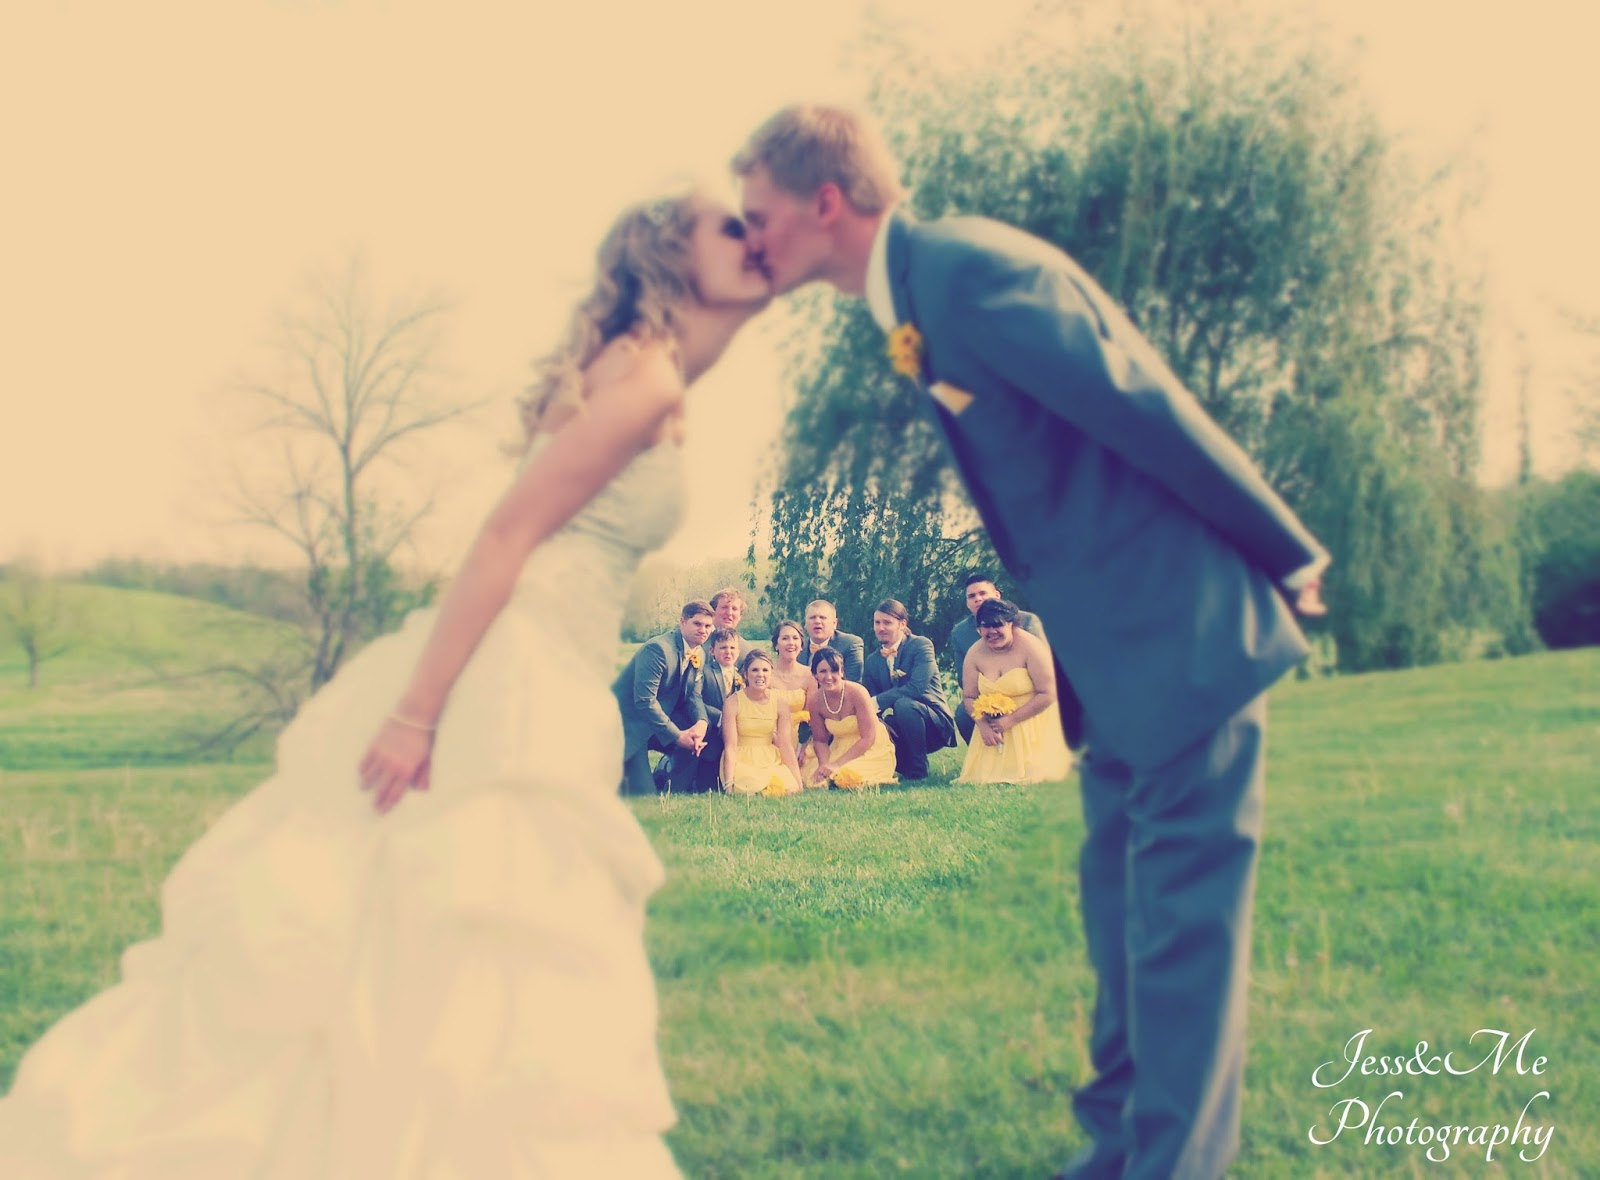 Jp smyth wedding